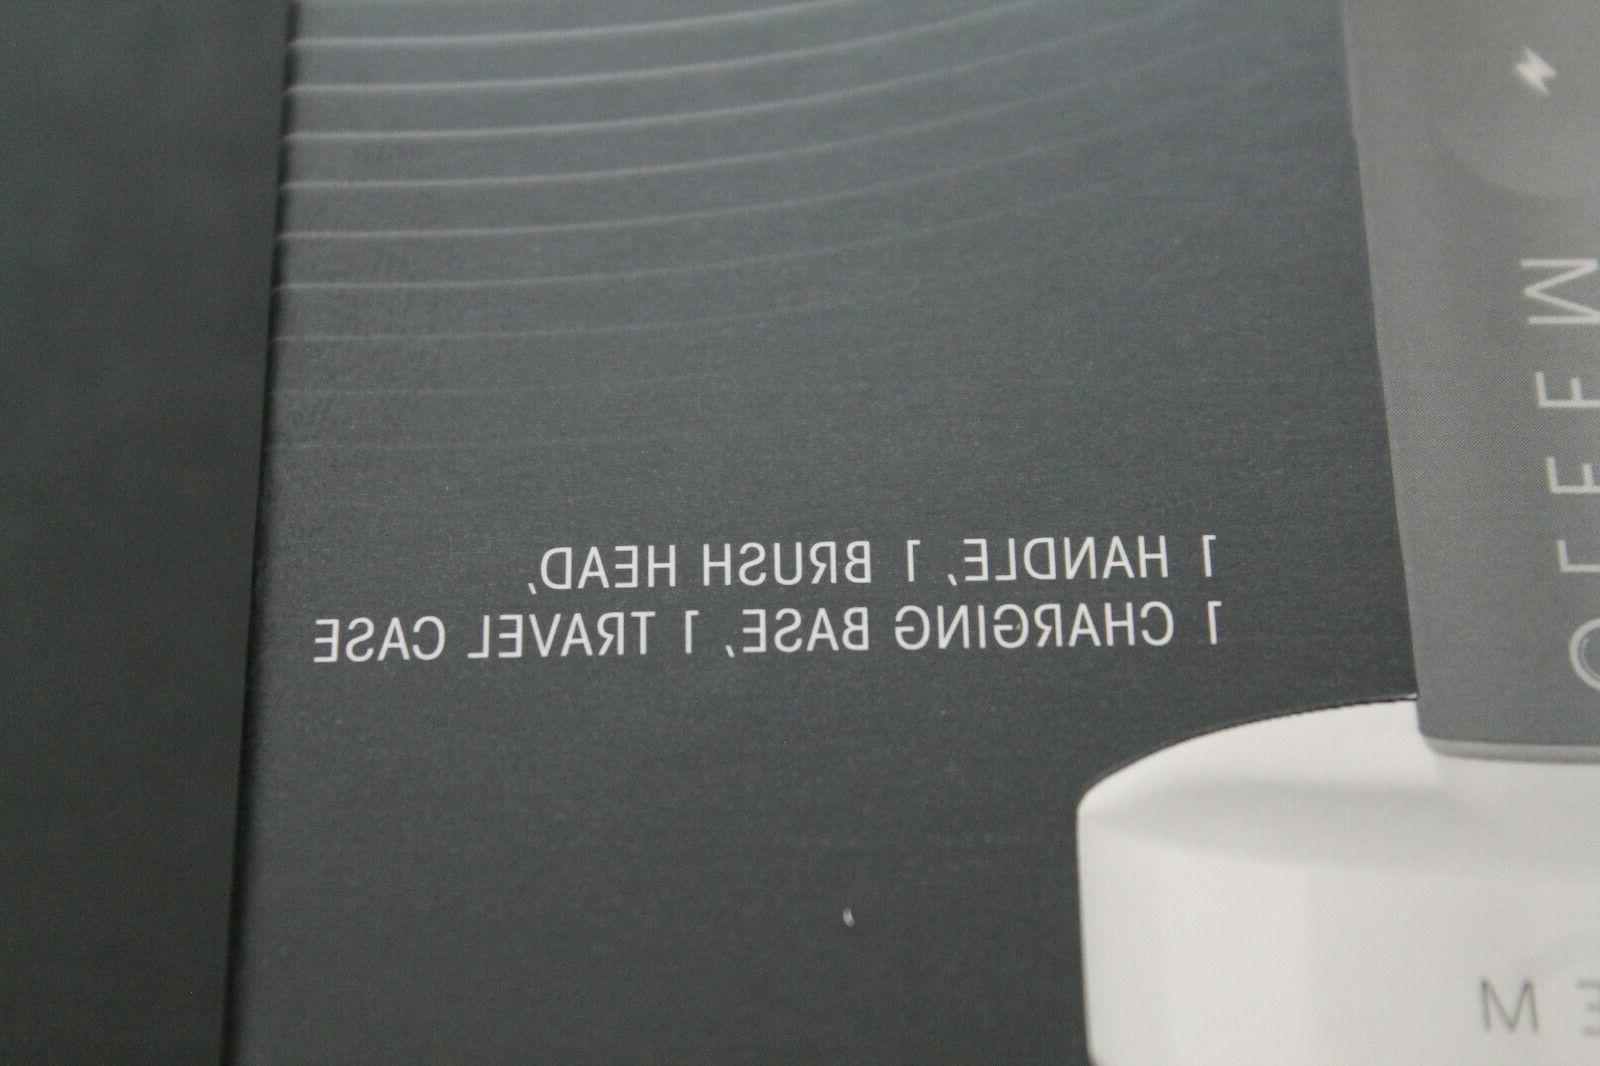 GLEEM RECHARGEABLE ELECTRIC TOOTHBRUSH SLATE